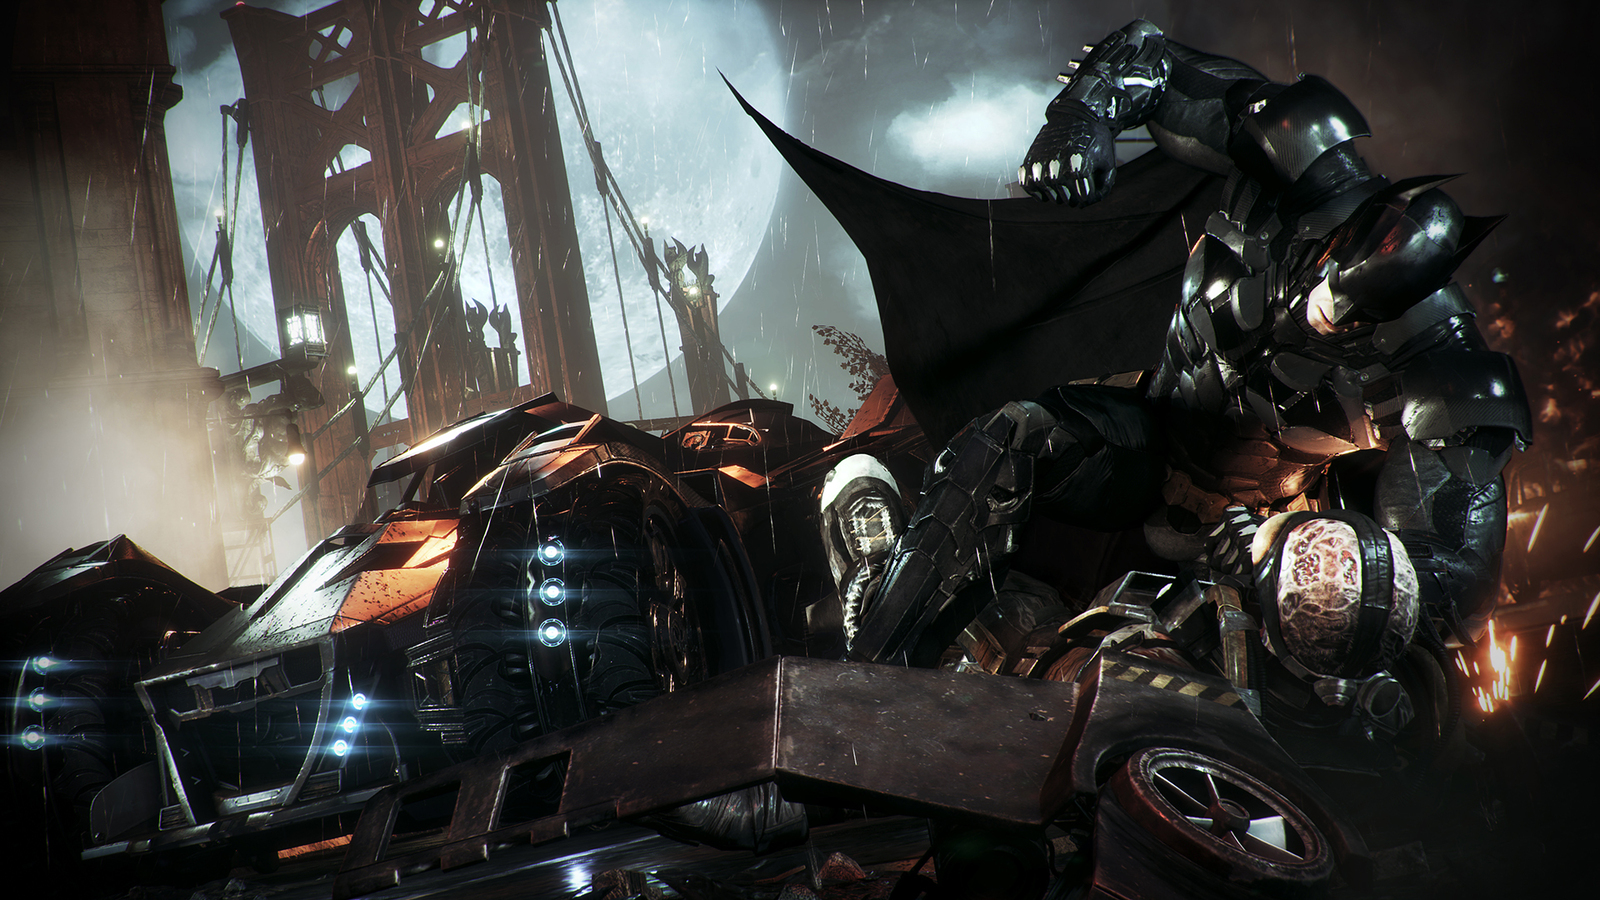 Batman Arkham Knight for PS4 image